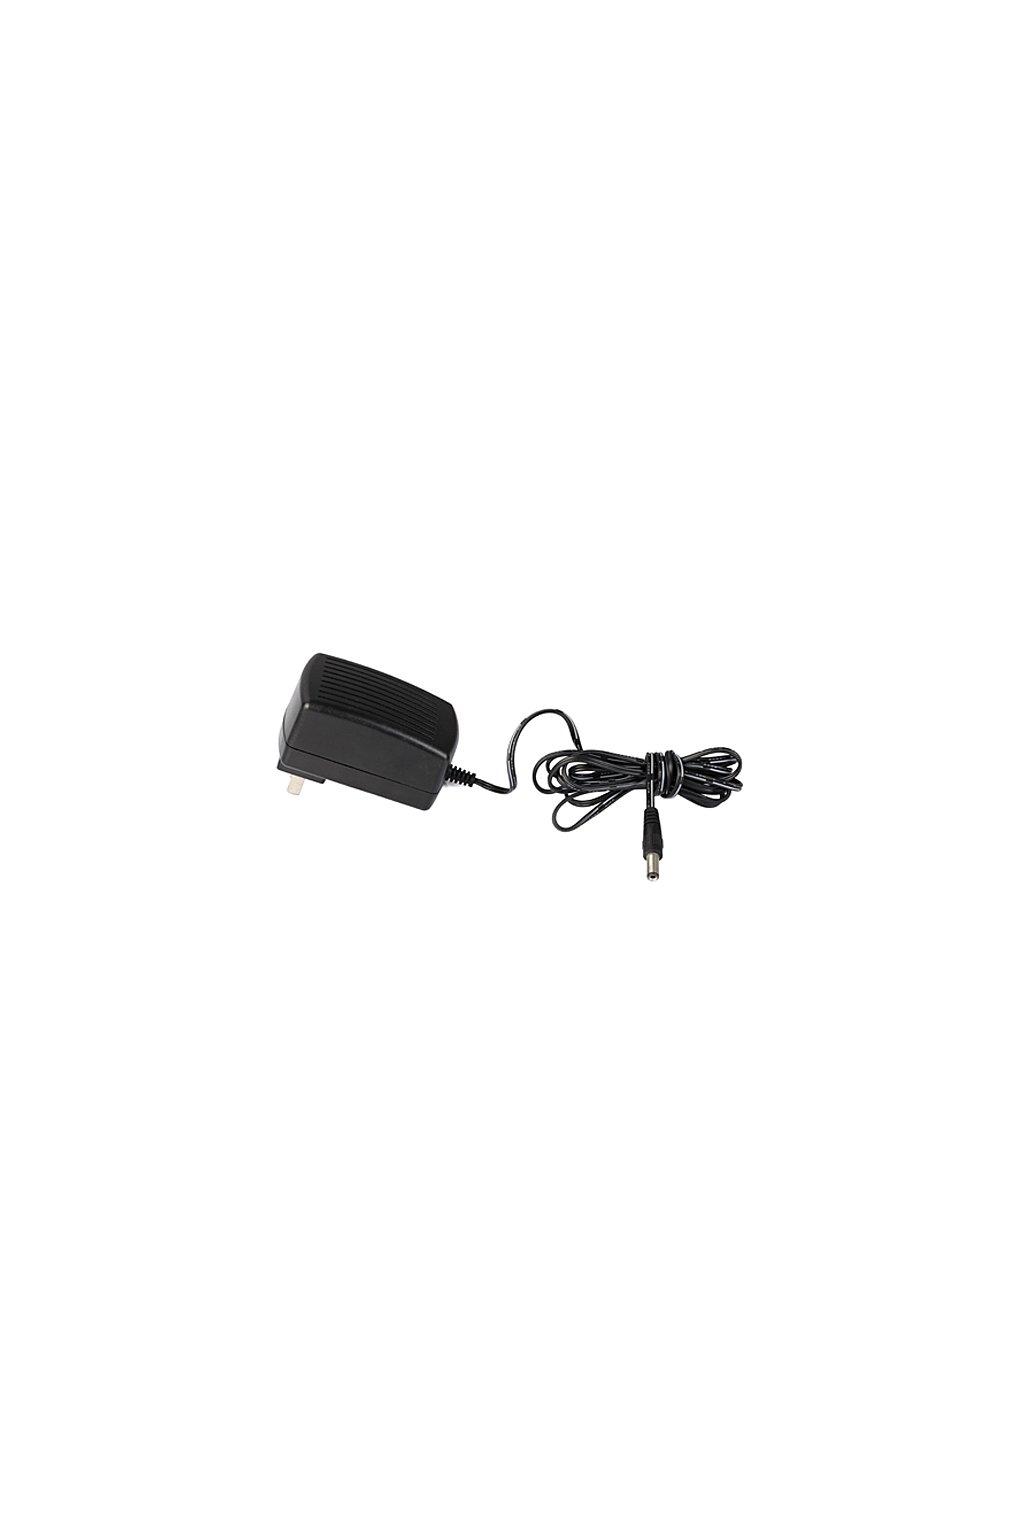 Duoro XCONTROL hálózati adapter